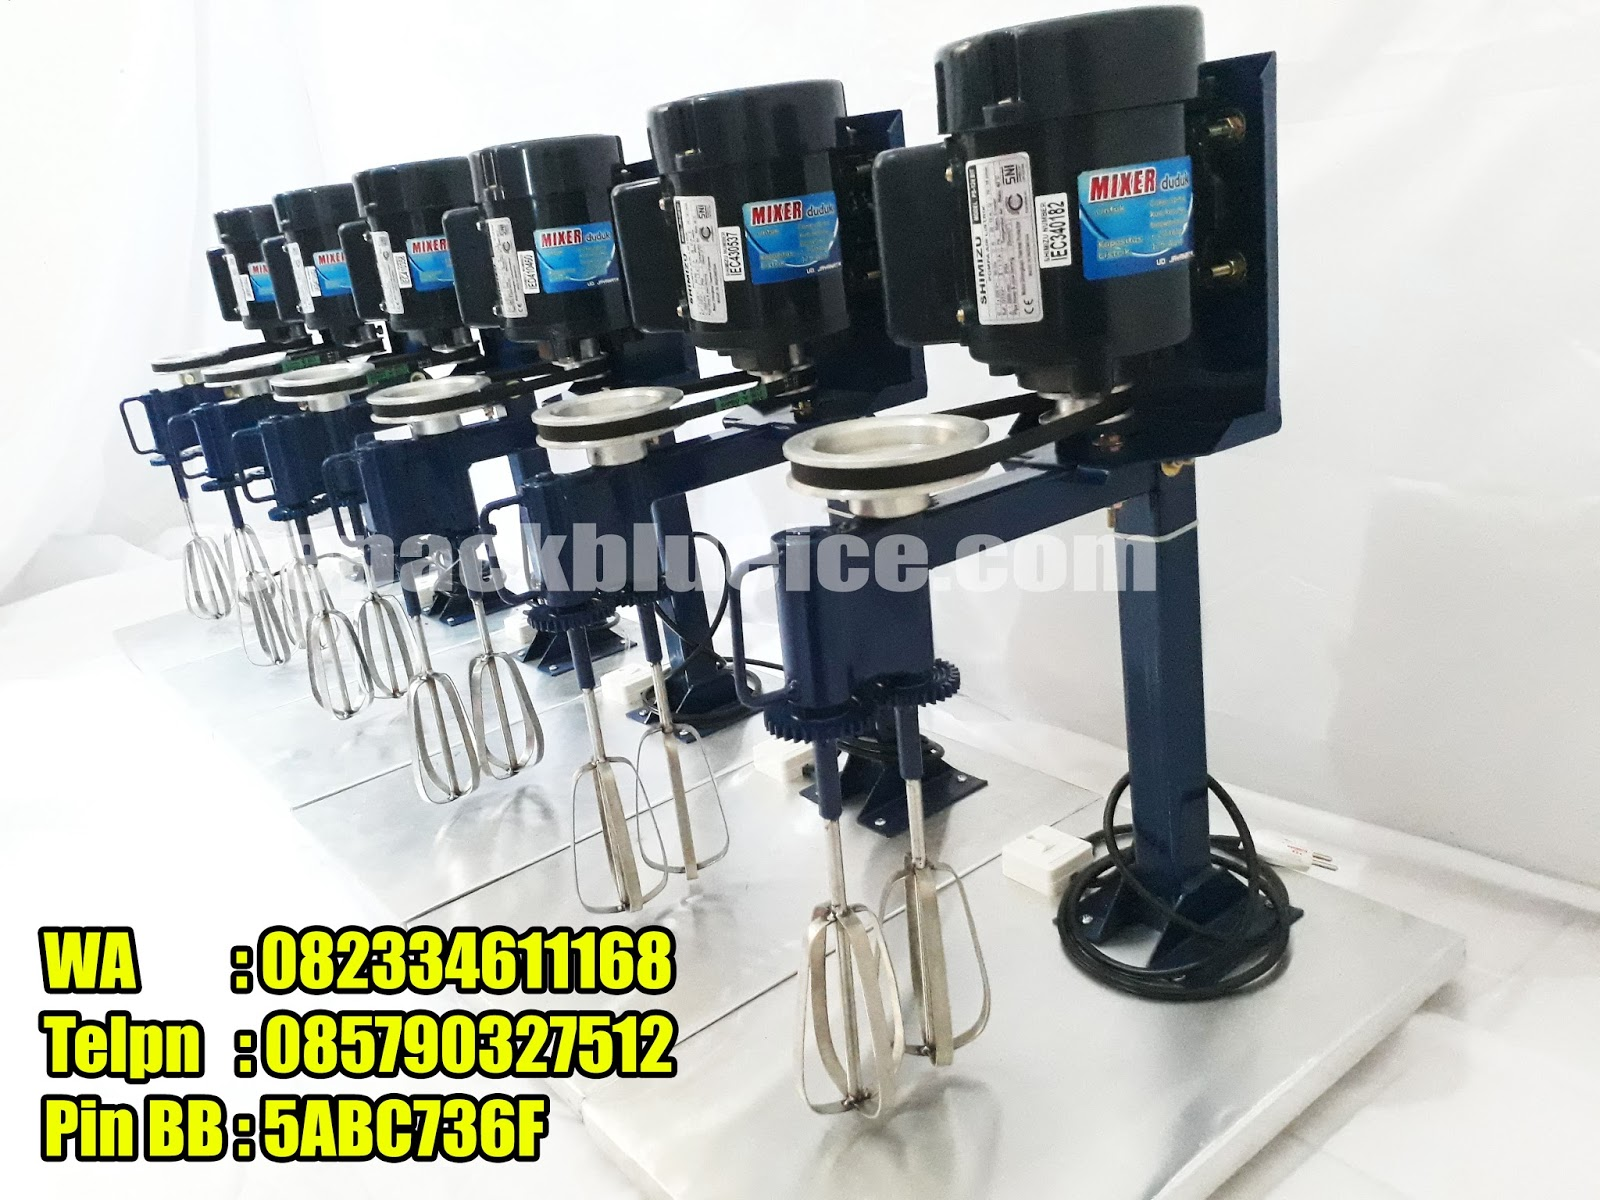 Harga Mesin Pengaduk Es Krim Mixer Cream 082334611168 Babypax Cooler Bag Blue Paket Baby Pack Murah Pax